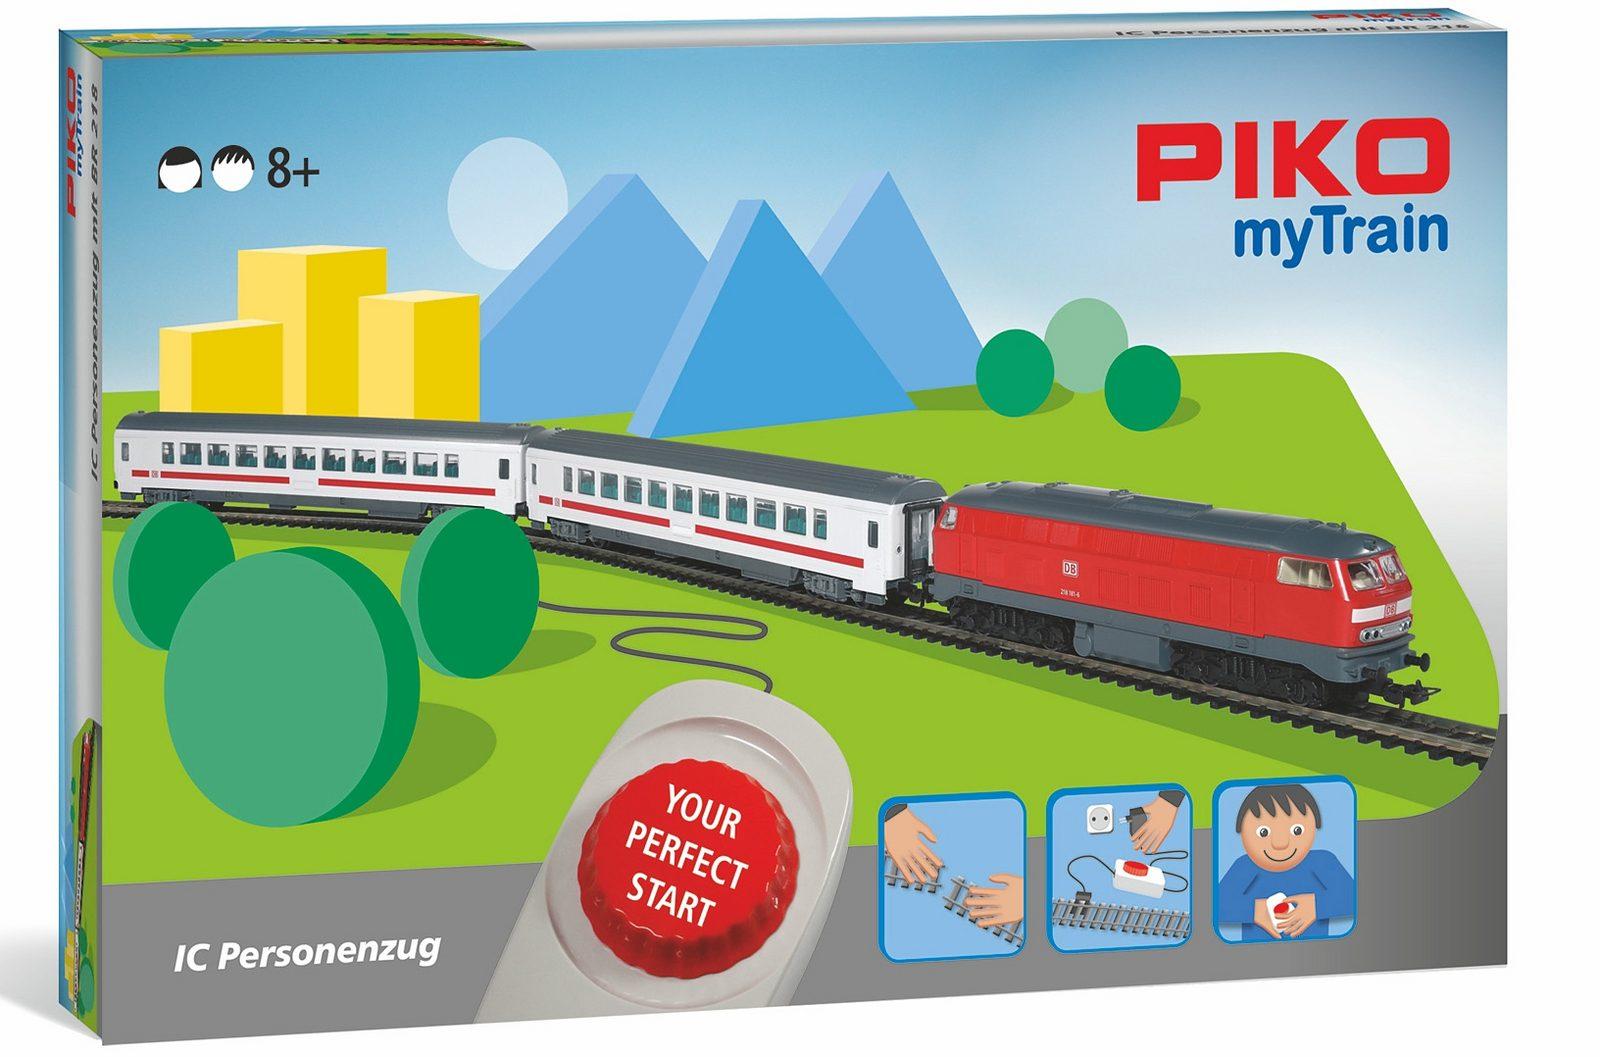 PIKO Modelleisenbahn Startset, »PIKO myTrain, IC-Zug, DB AG - Gleichstrom« Spur H0 - broschei